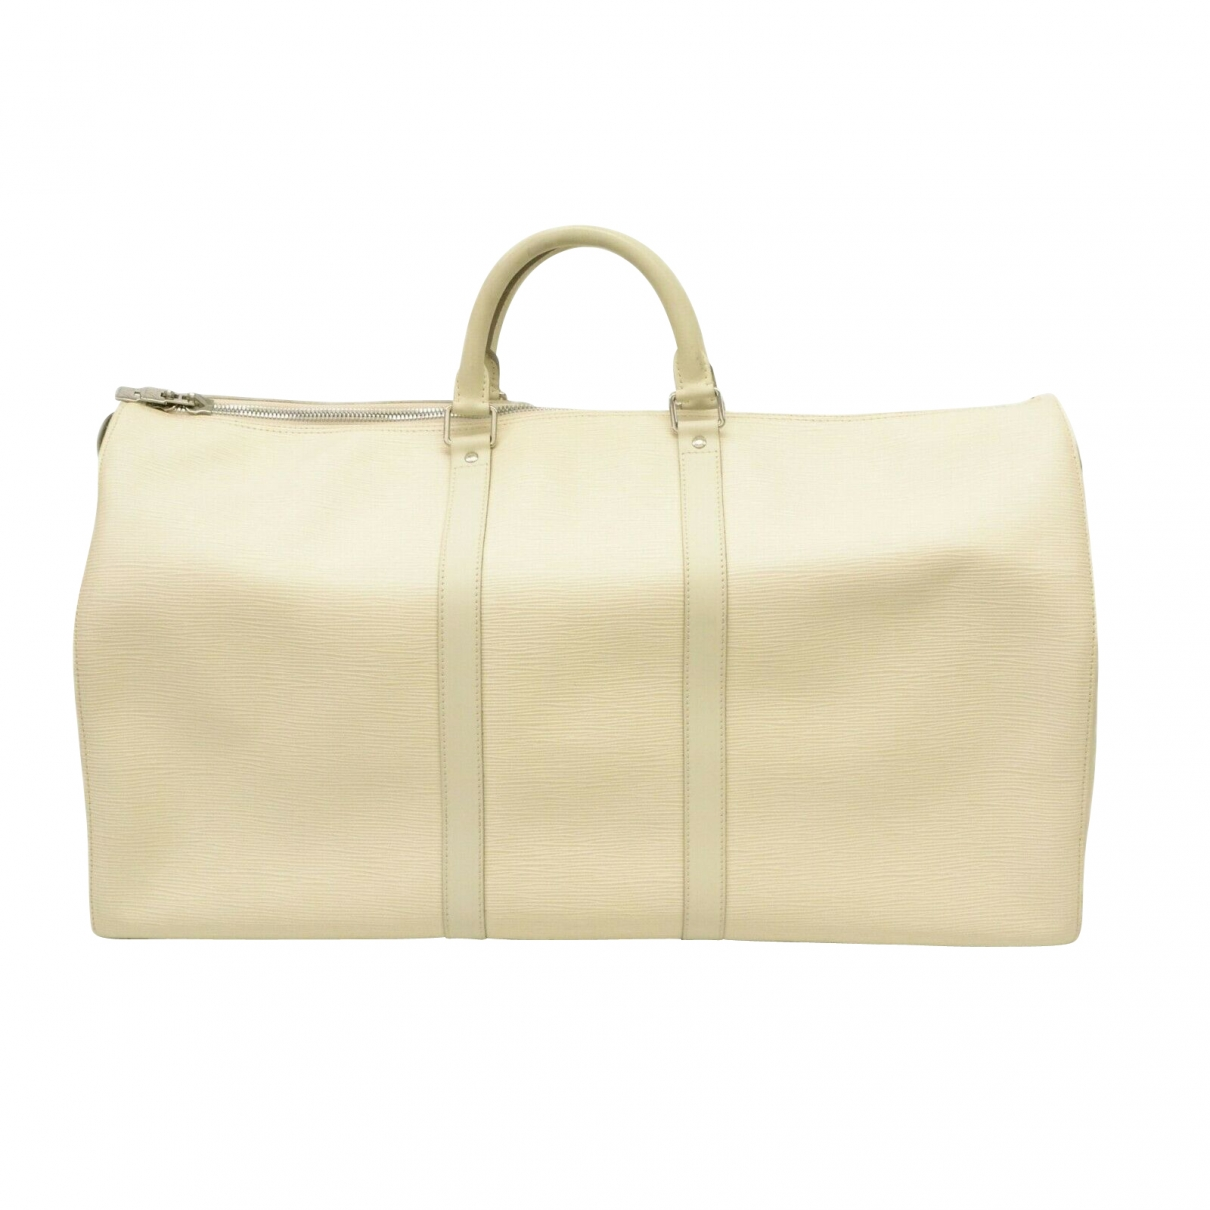 Louis Vuitton Keepall Reisetasche in  Weiss Leder